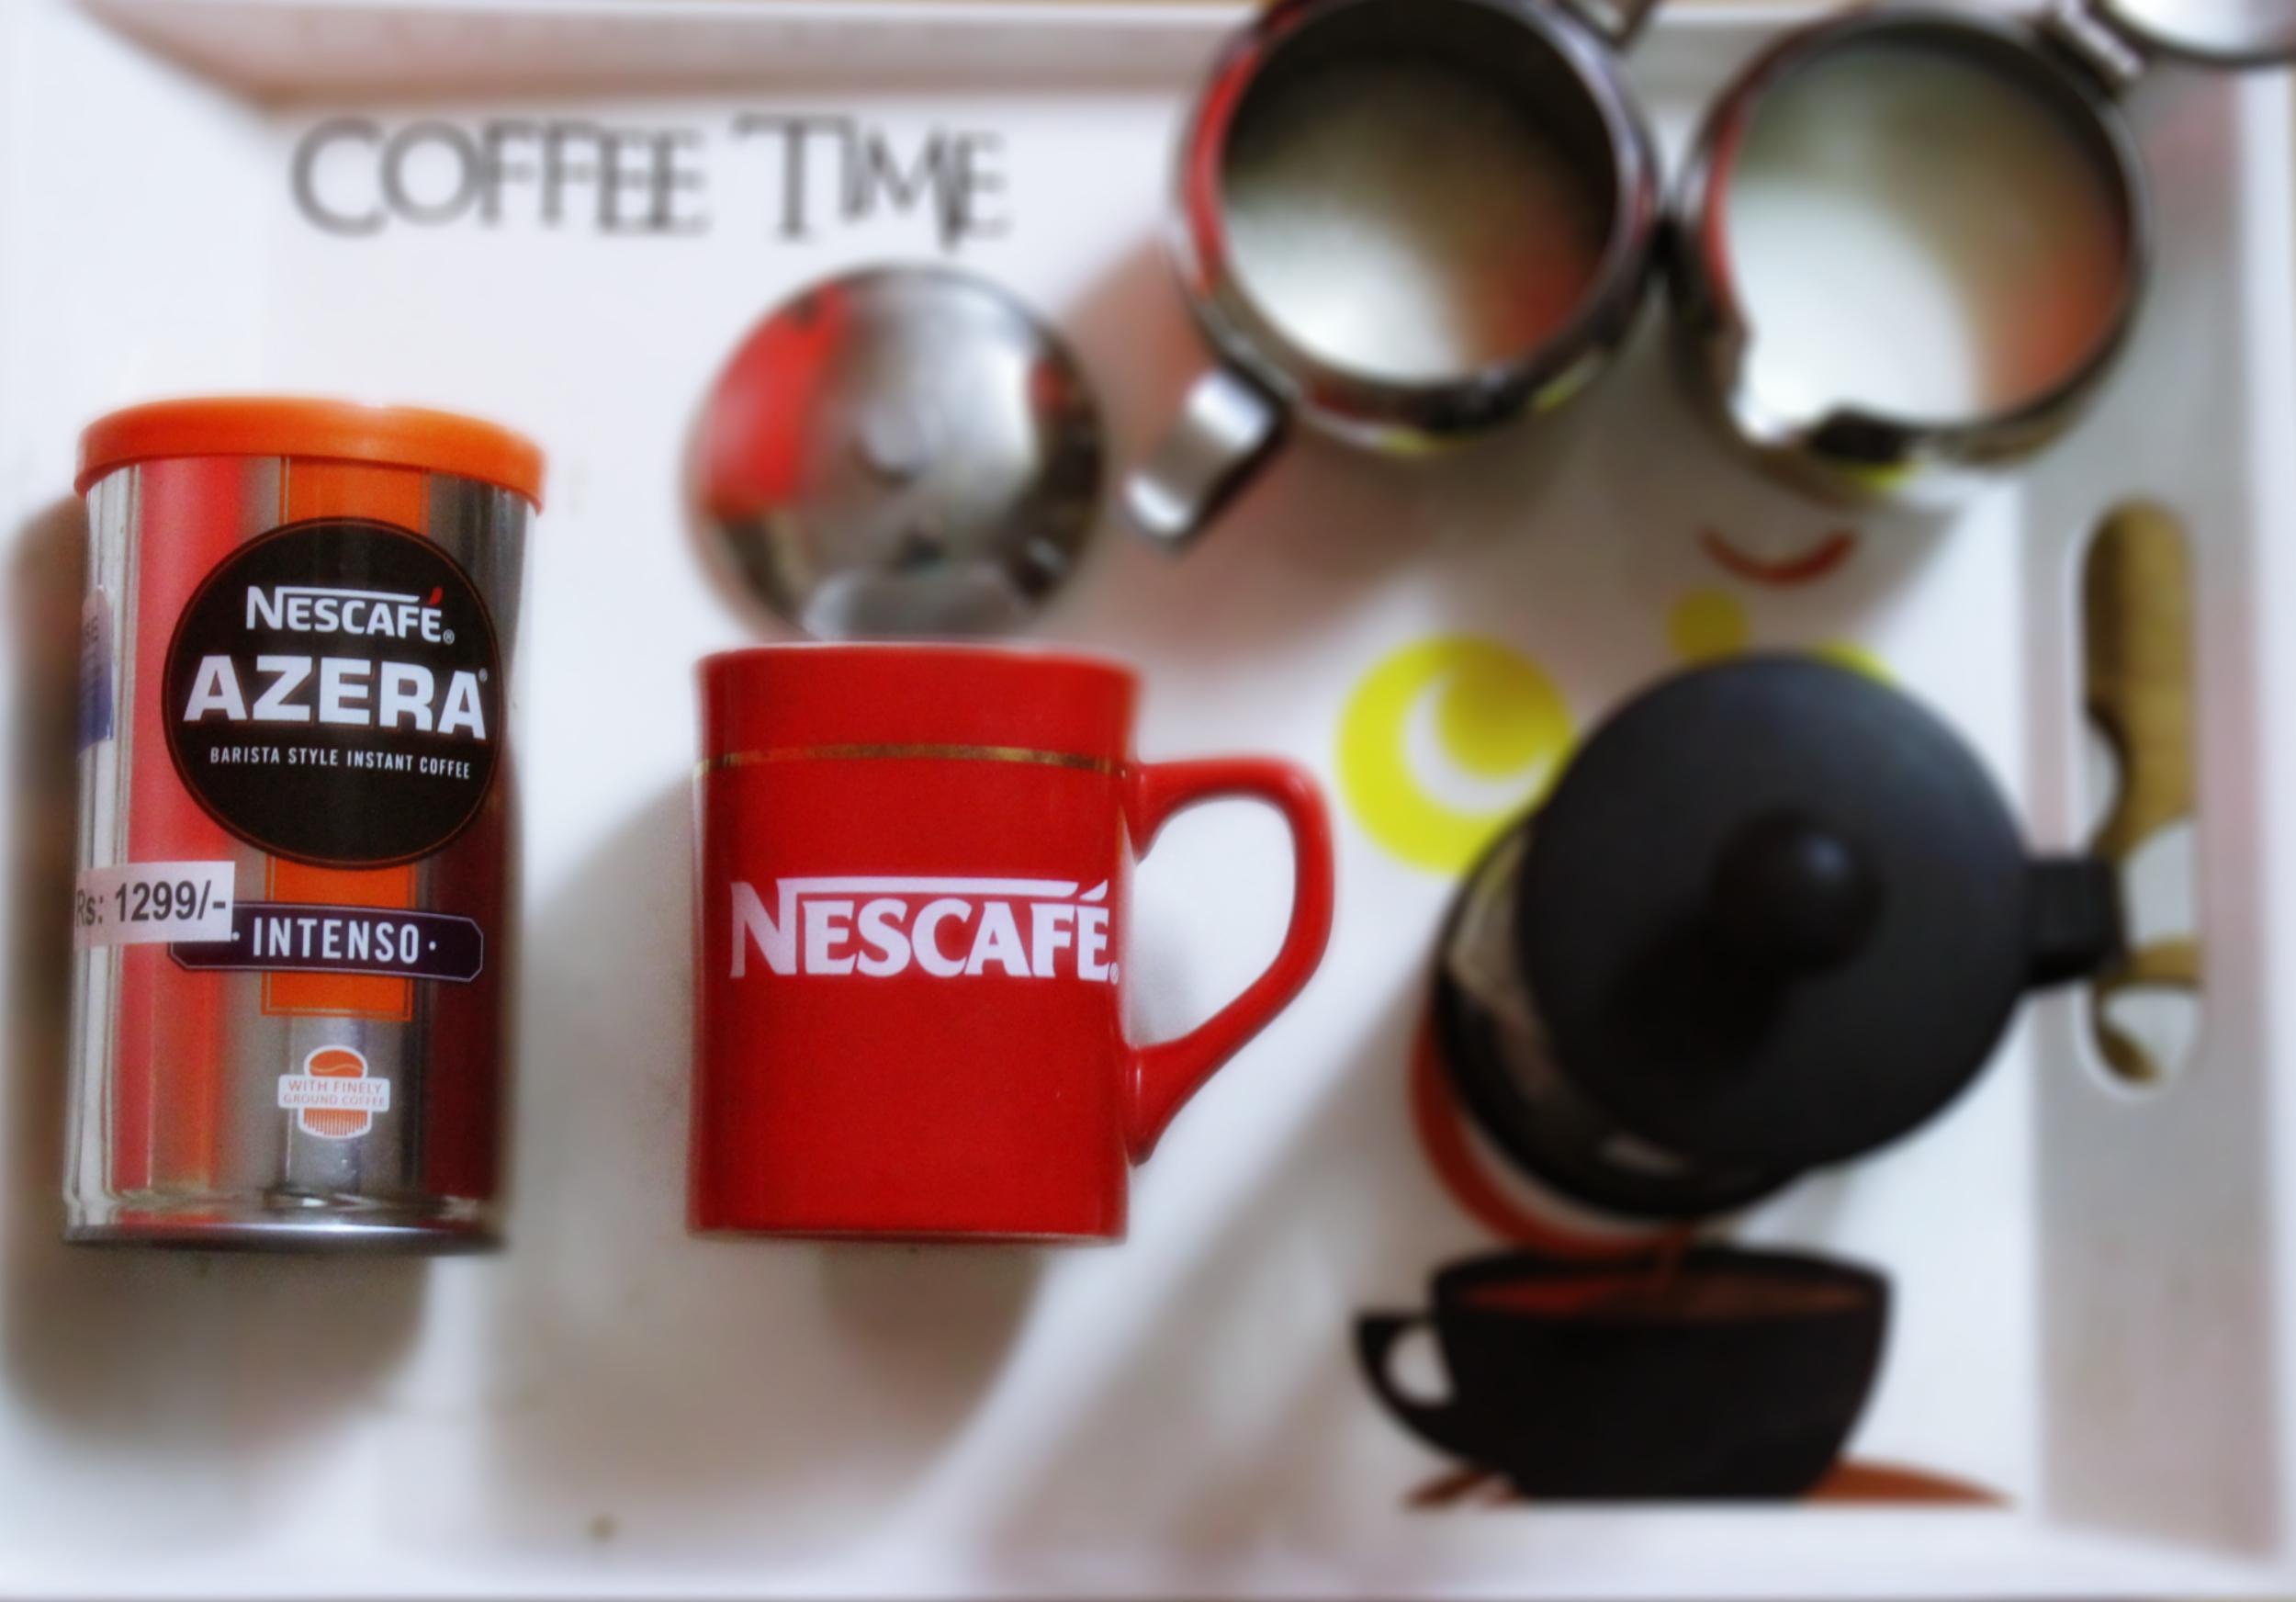 Nescafe Azera Barista Style Coffee